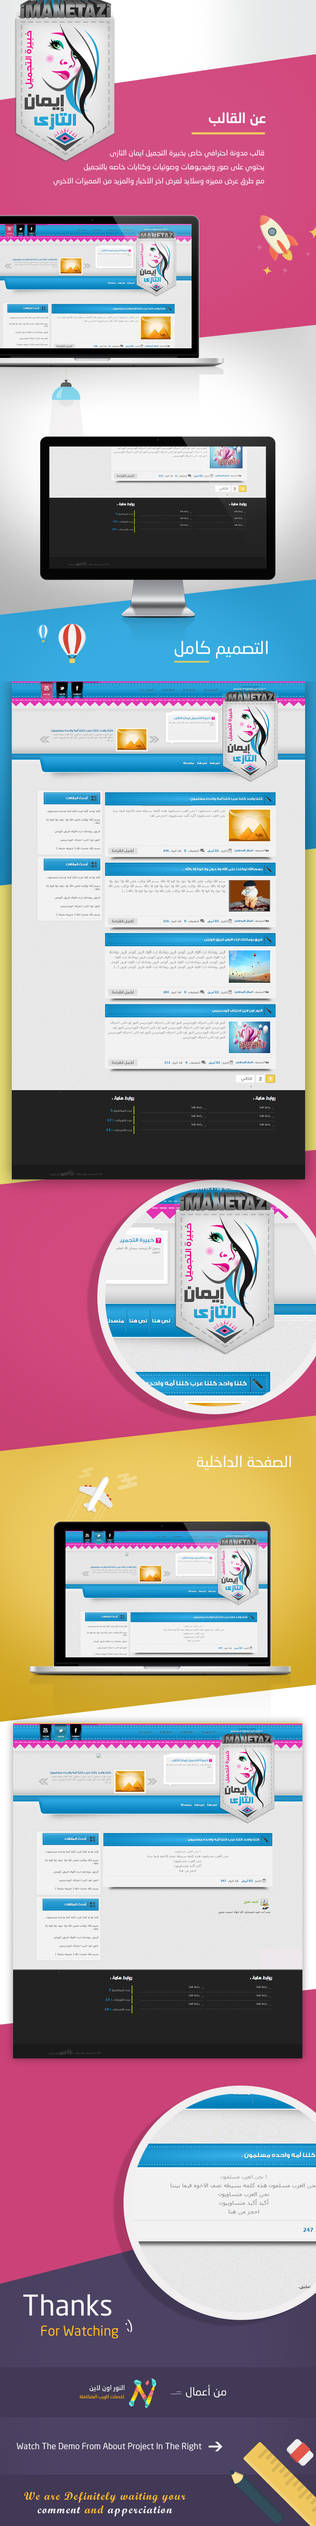 Iman Tazi Wordpress Blog